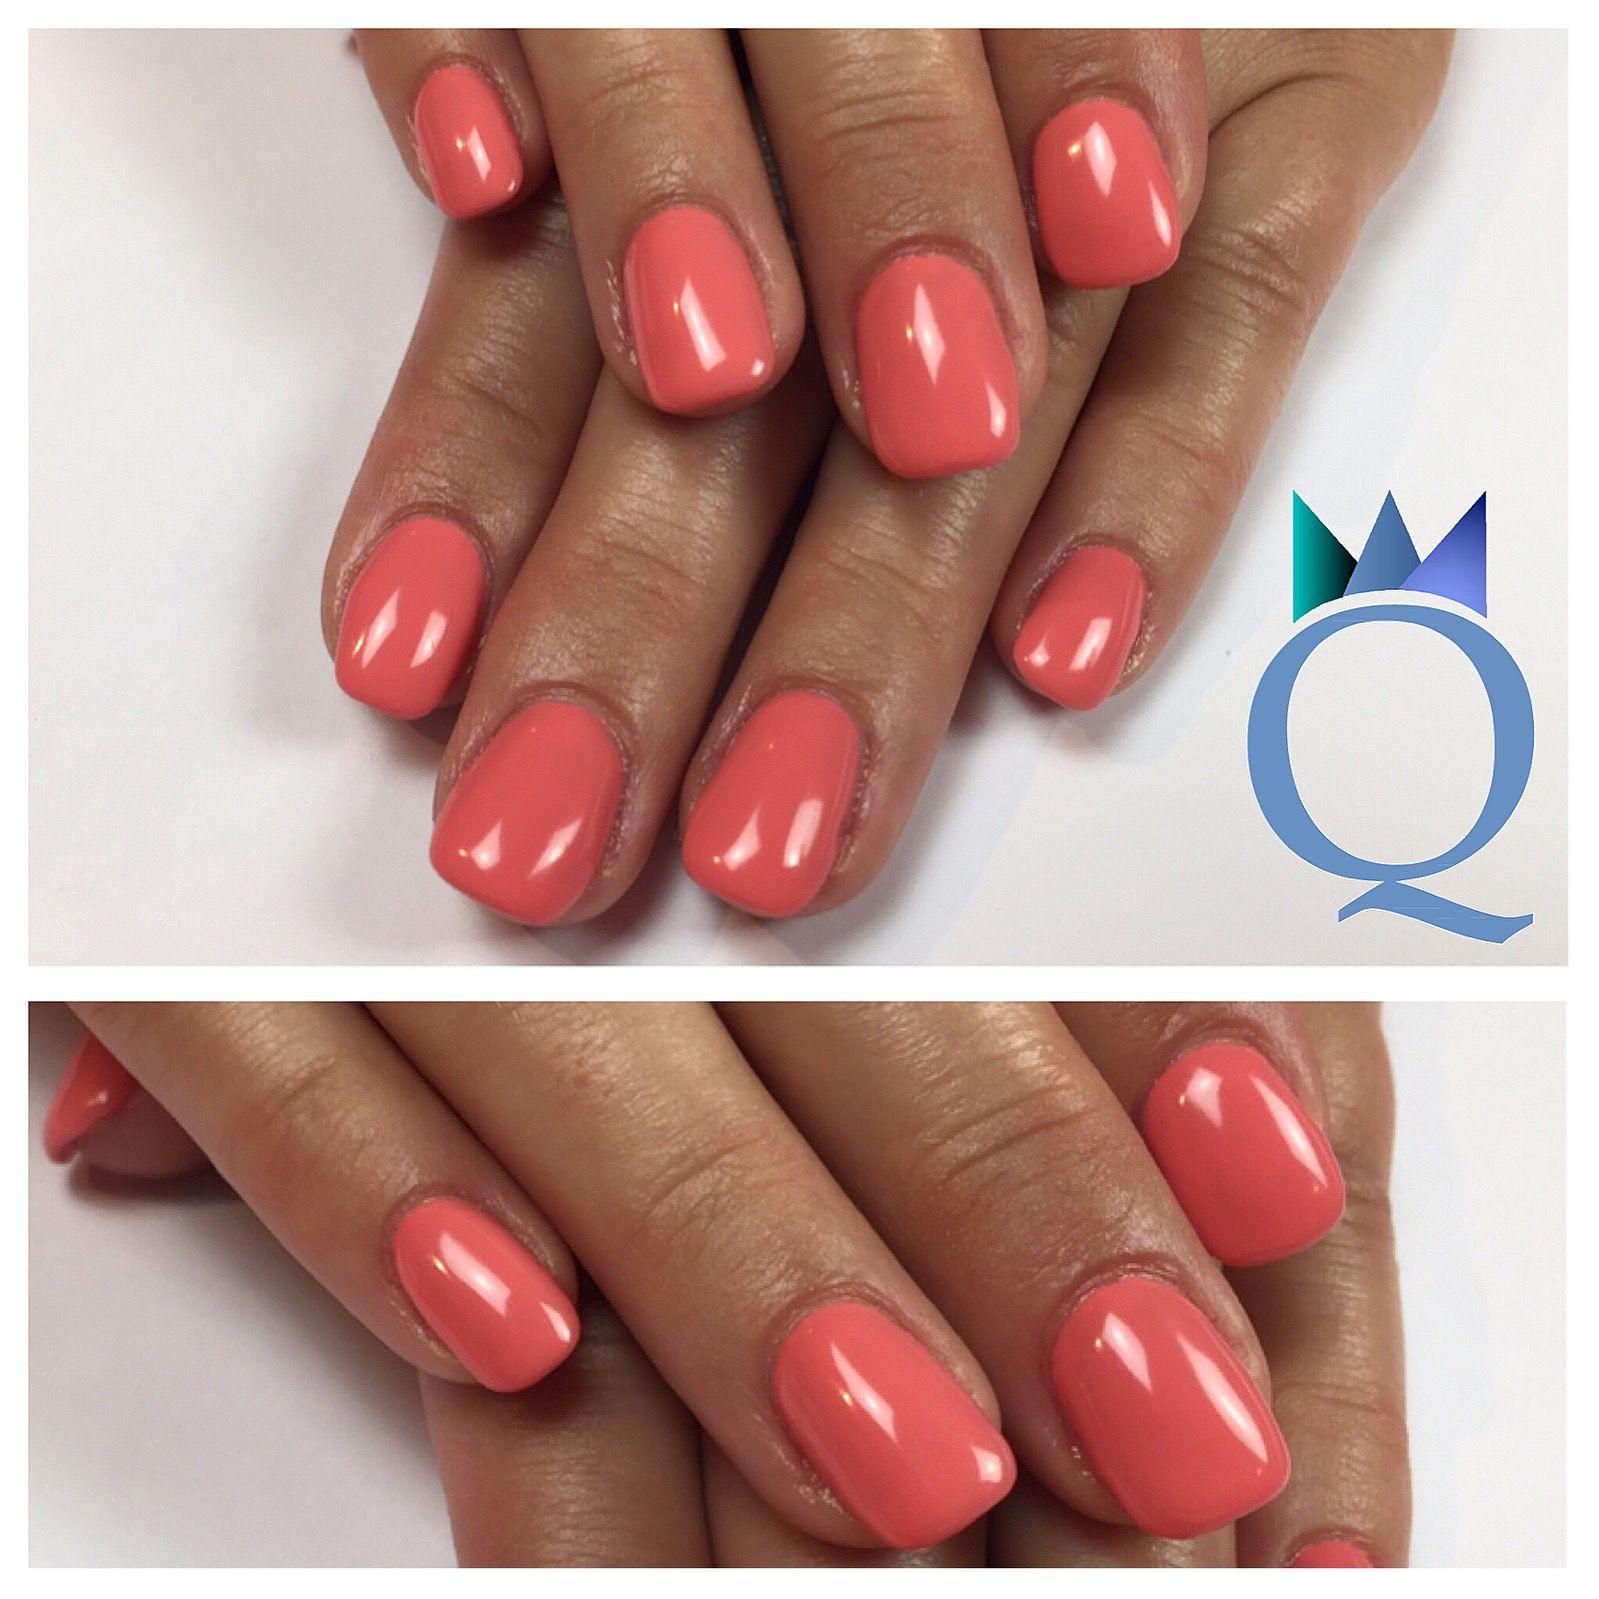 shortnails #gelnails #nails #coral #akyado #kurzenägel #gelnägel ...